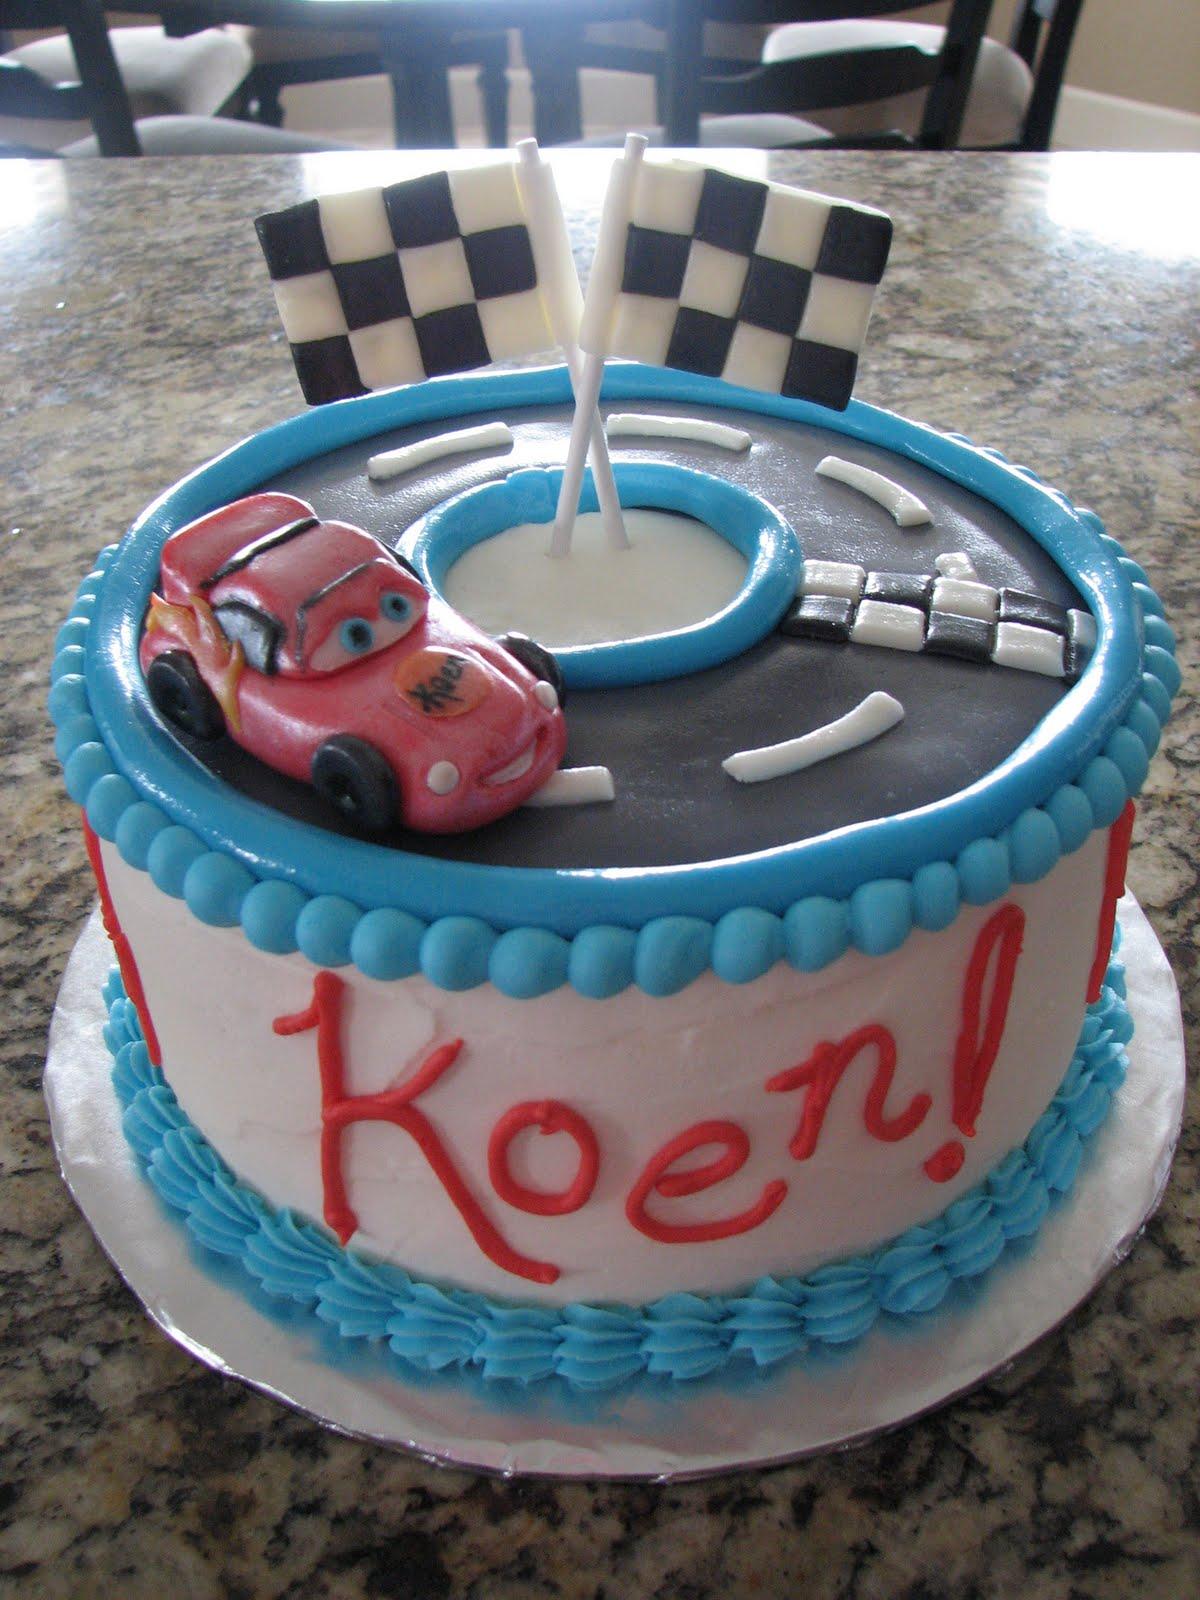 Lightning Mcqueen Birthday Cake Designs : Decadent Designs: Lightning McQueen Birthday Cake 8